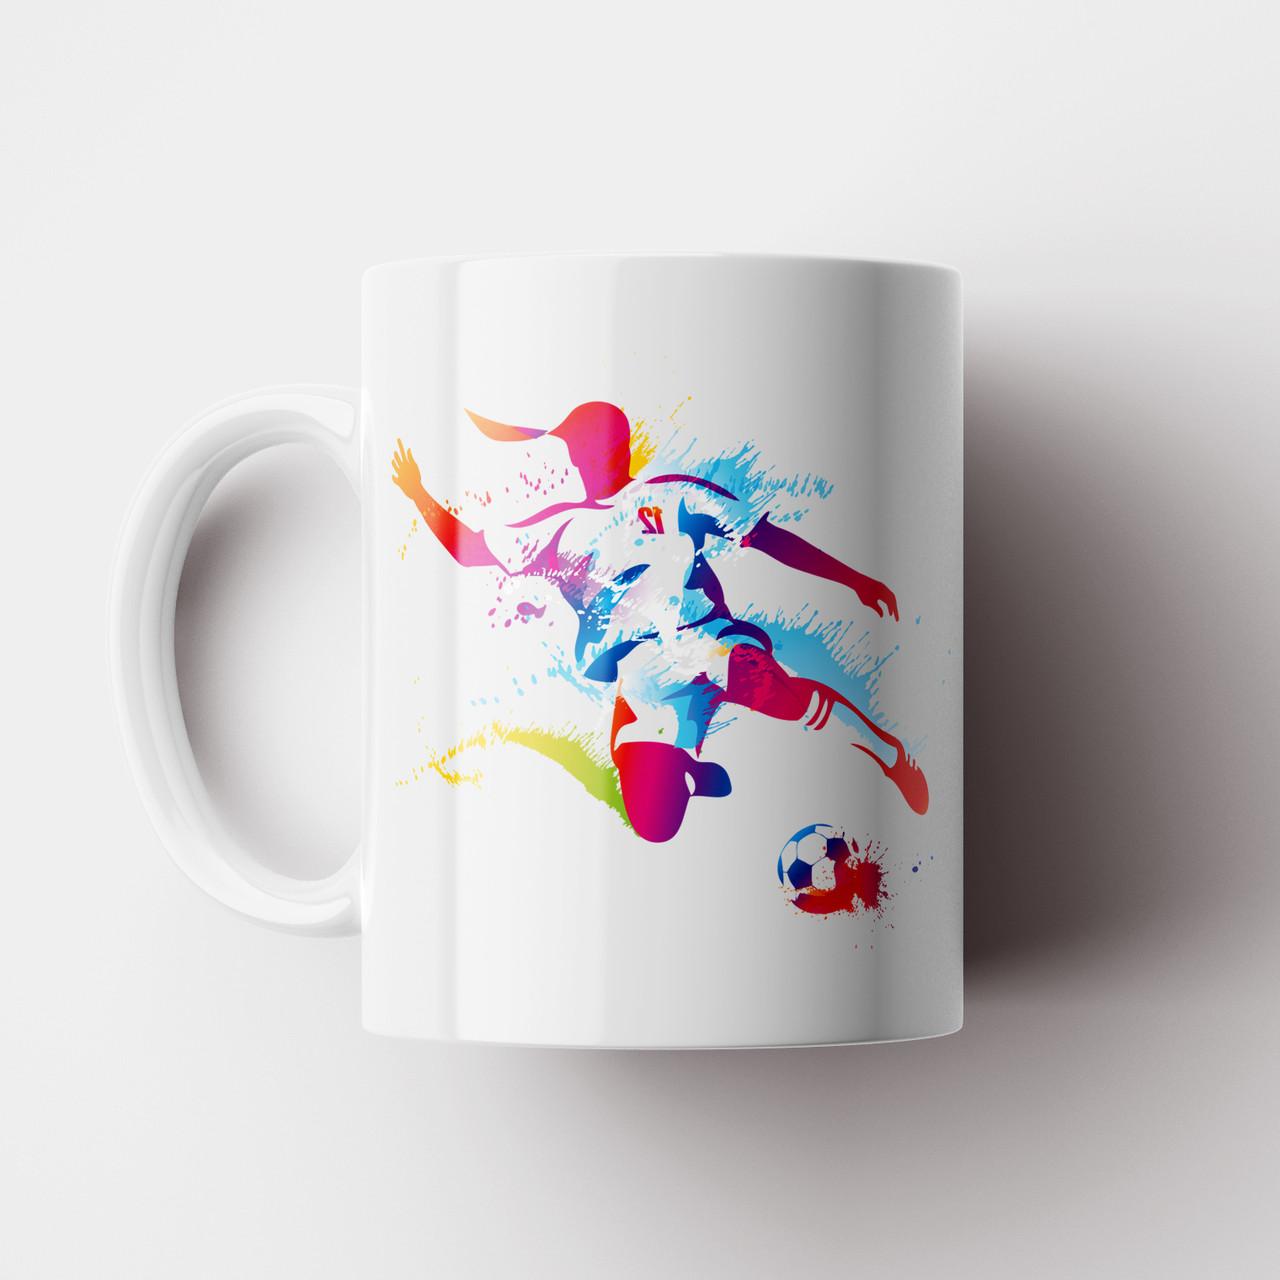 Чашка Футболист. Футбол. Чашка з фото